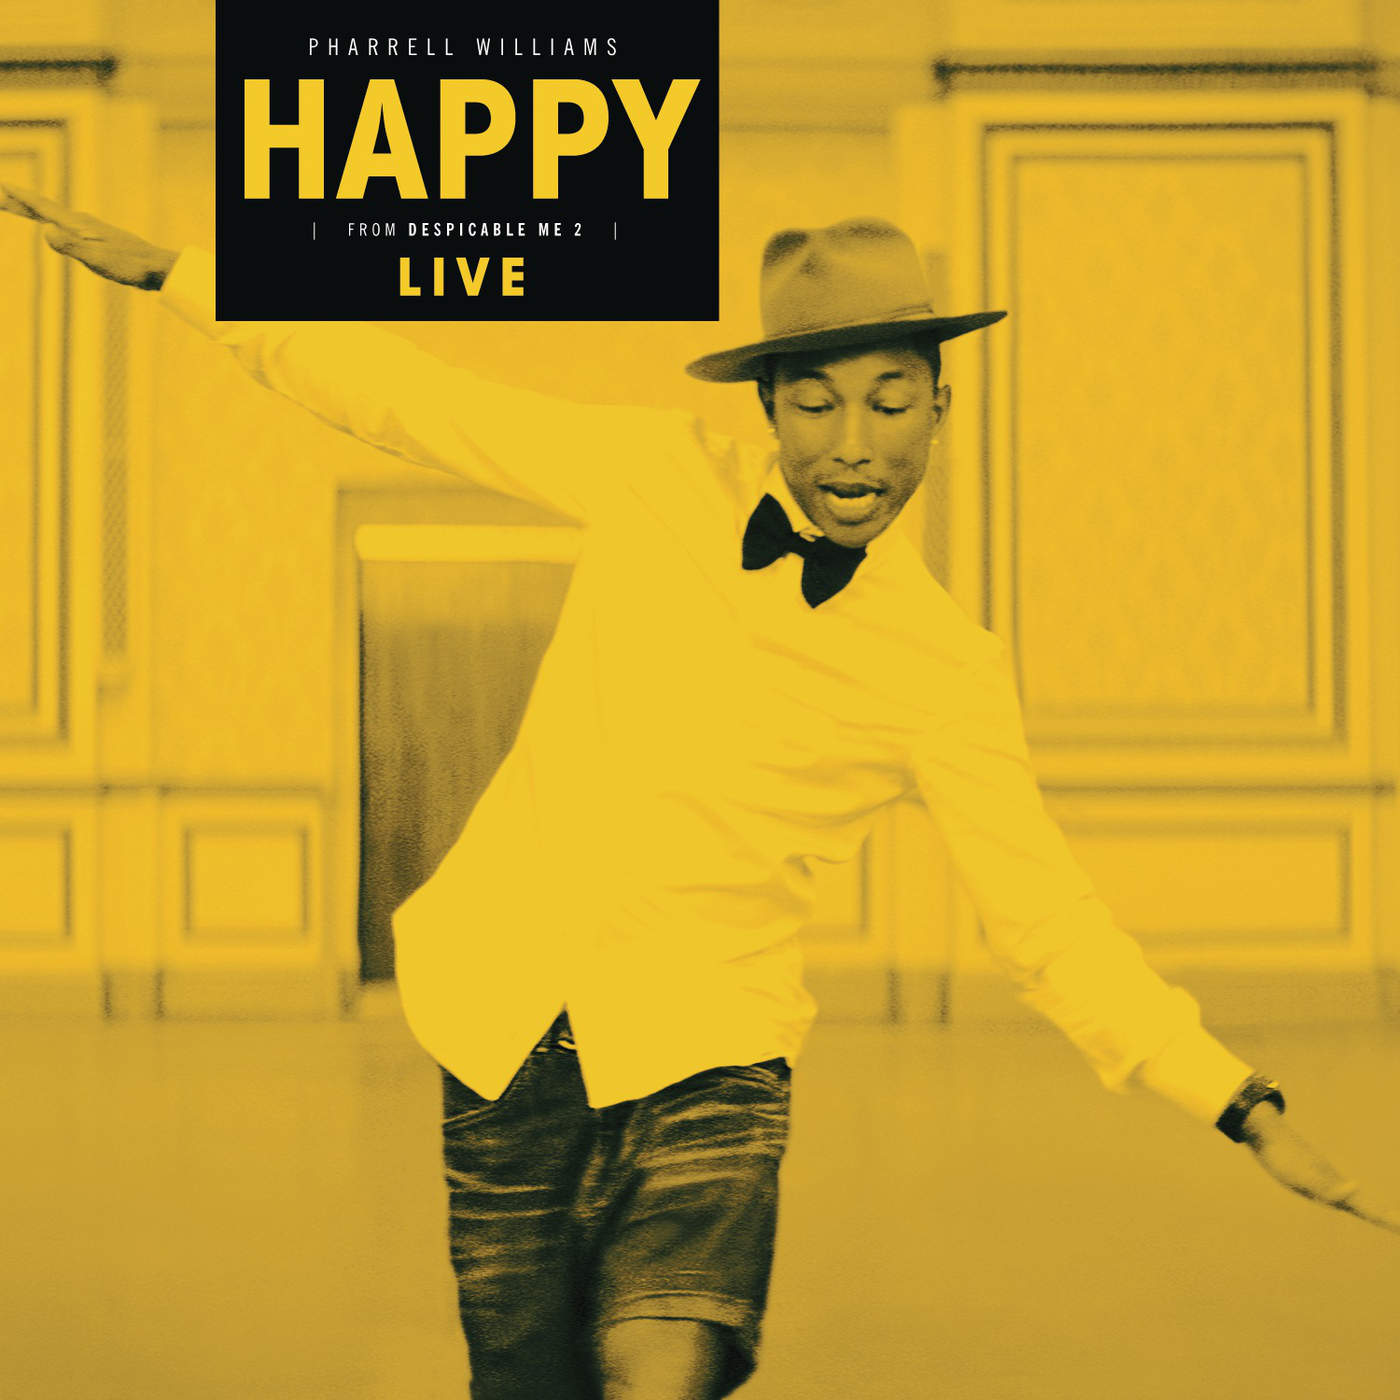 Pharrell Williams - Happy (Live) - Single Cover